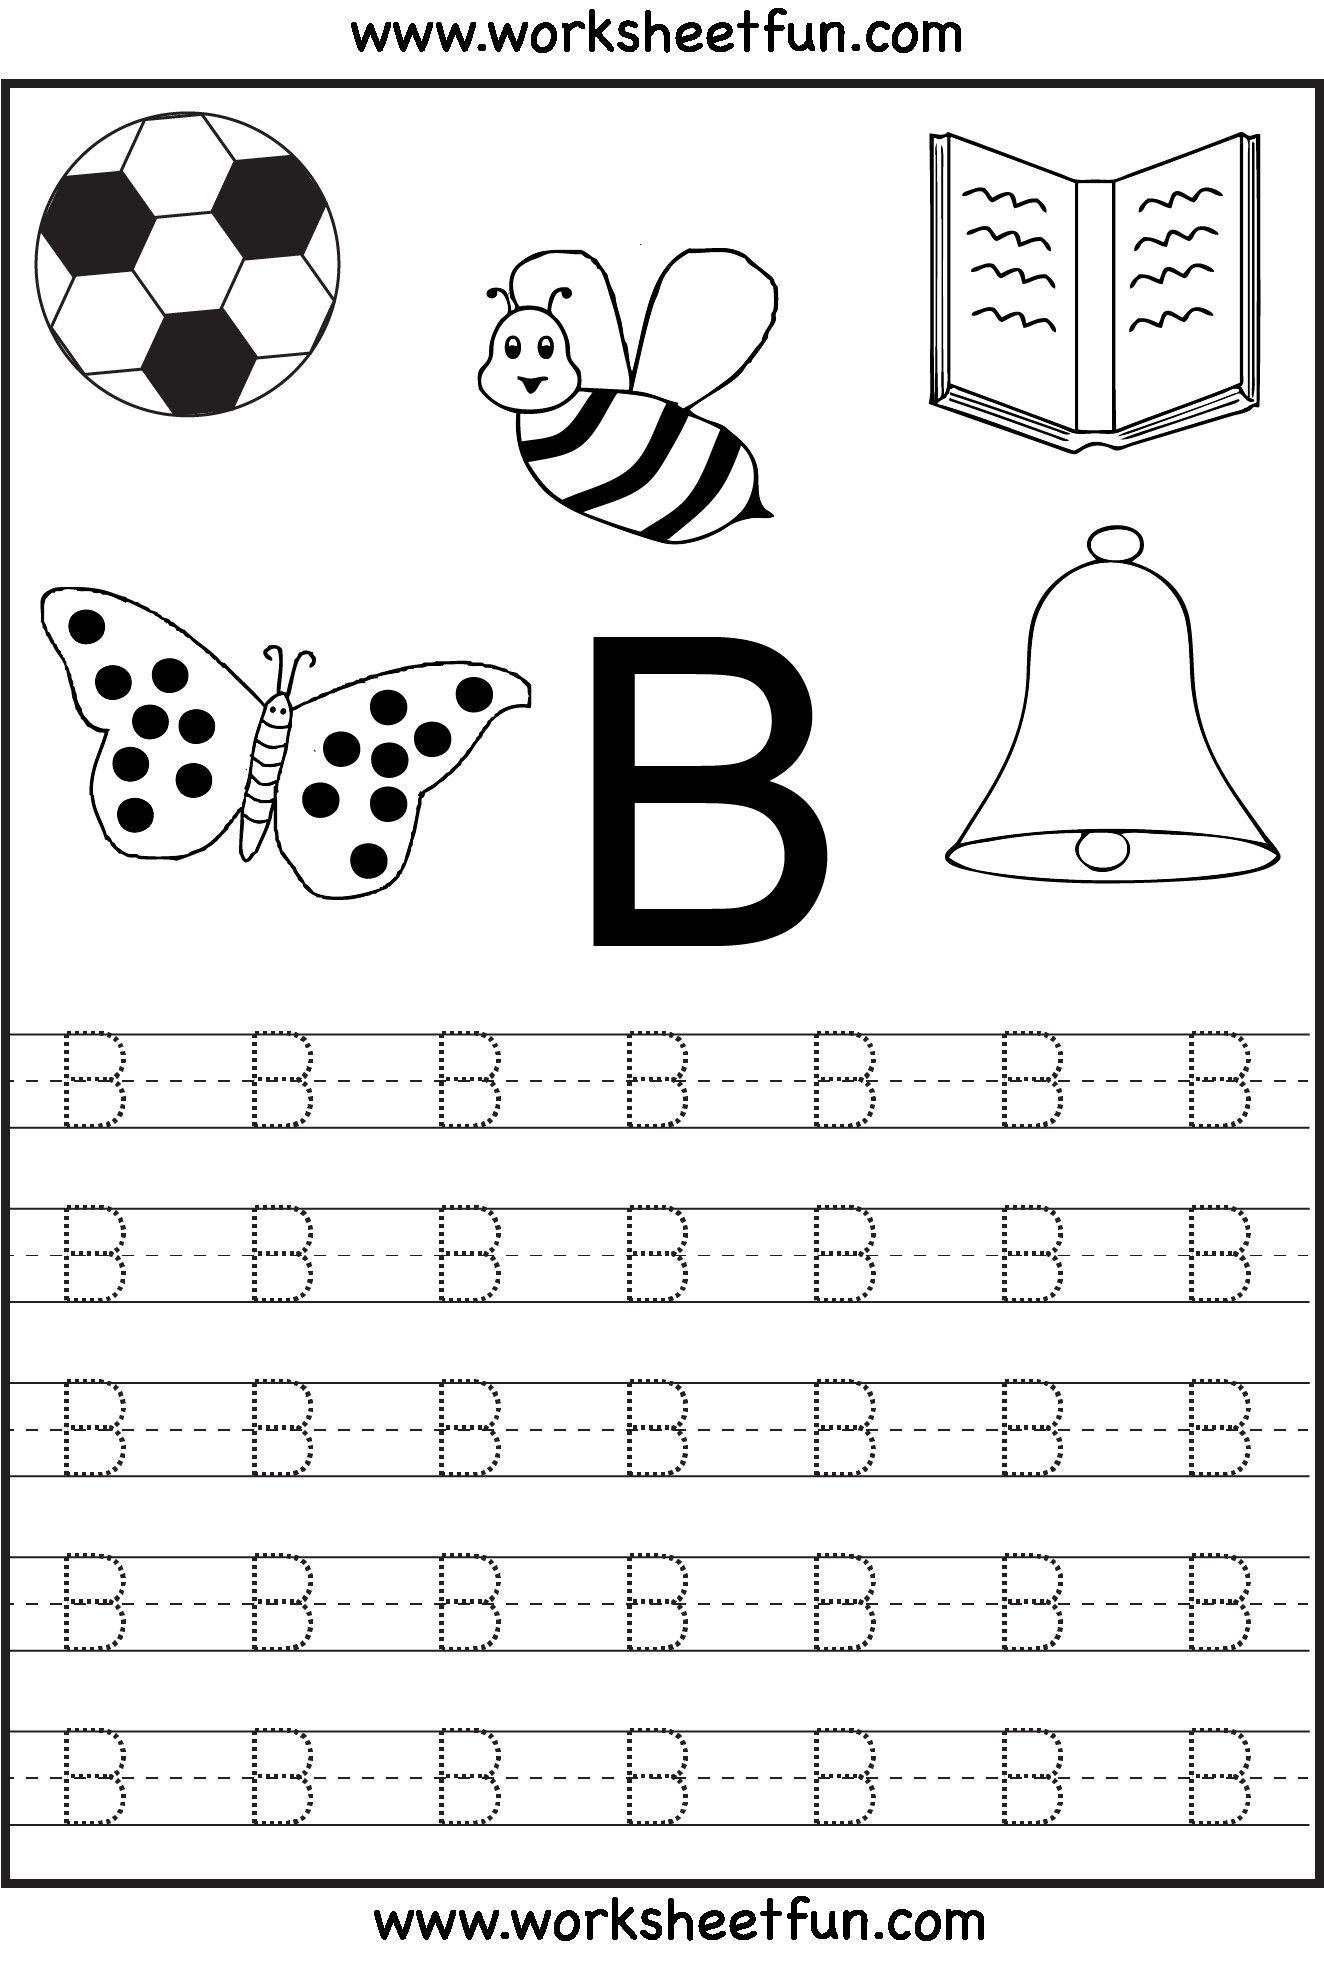 6 Letter F Worksheet Free Printables 1 001 In 2020 Alphabet Worksheets Preschool Alphabet Tracing Worksheets Letter Tracing Worksheets